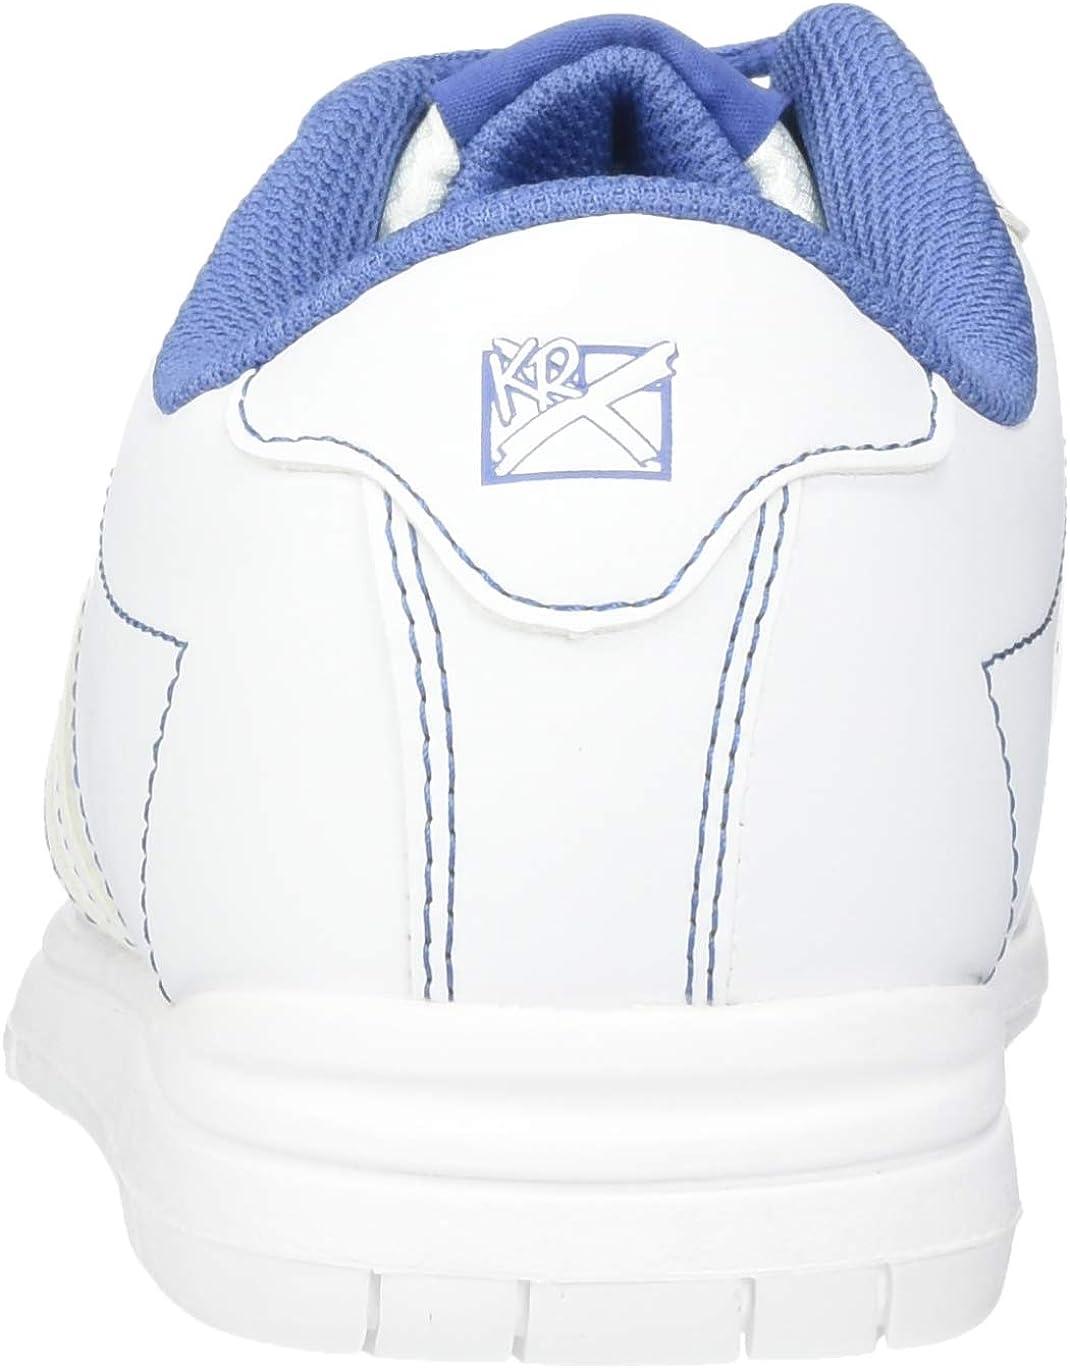 Unisex Strikeforce Womens O.P.P Bowling Shoes White//Periwinkle KR Strikeforce Womens O.p.p Bowling Shoes White//Periwinkle